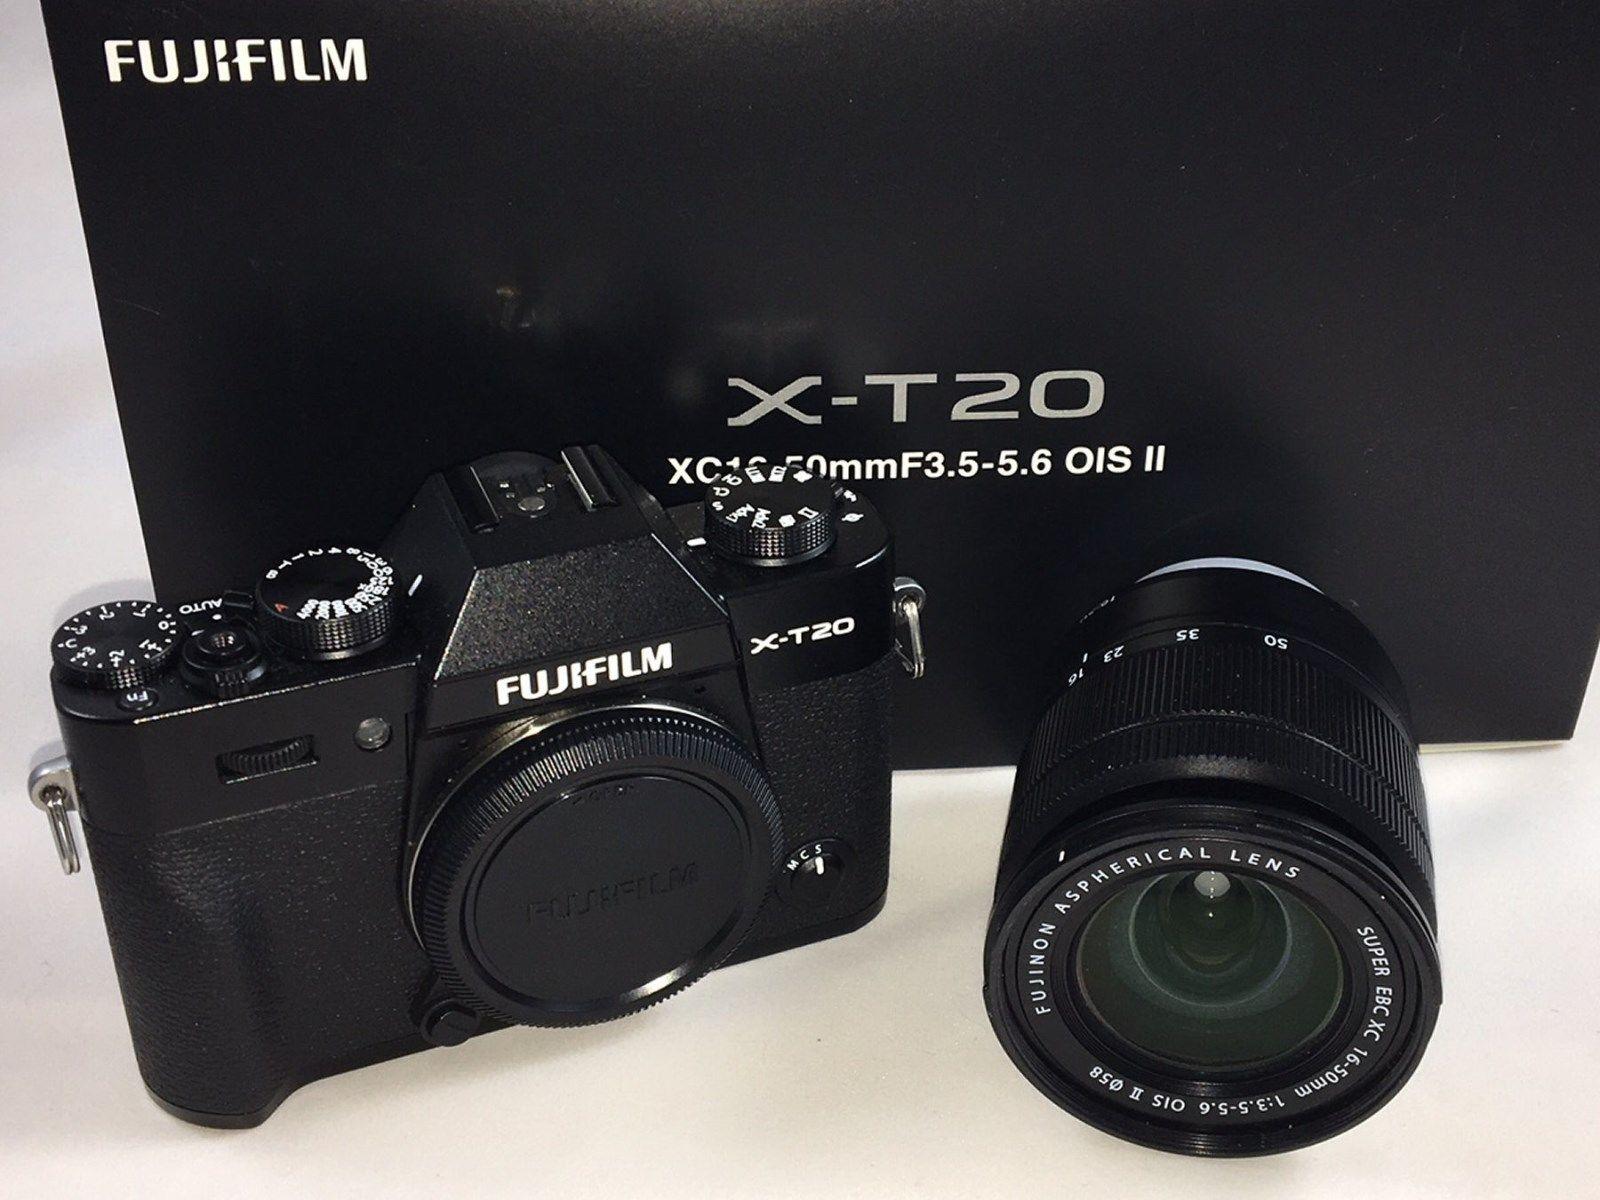 Fujifilm X-T20 mit XC16-50mm II Objektiv Kit, schwarz